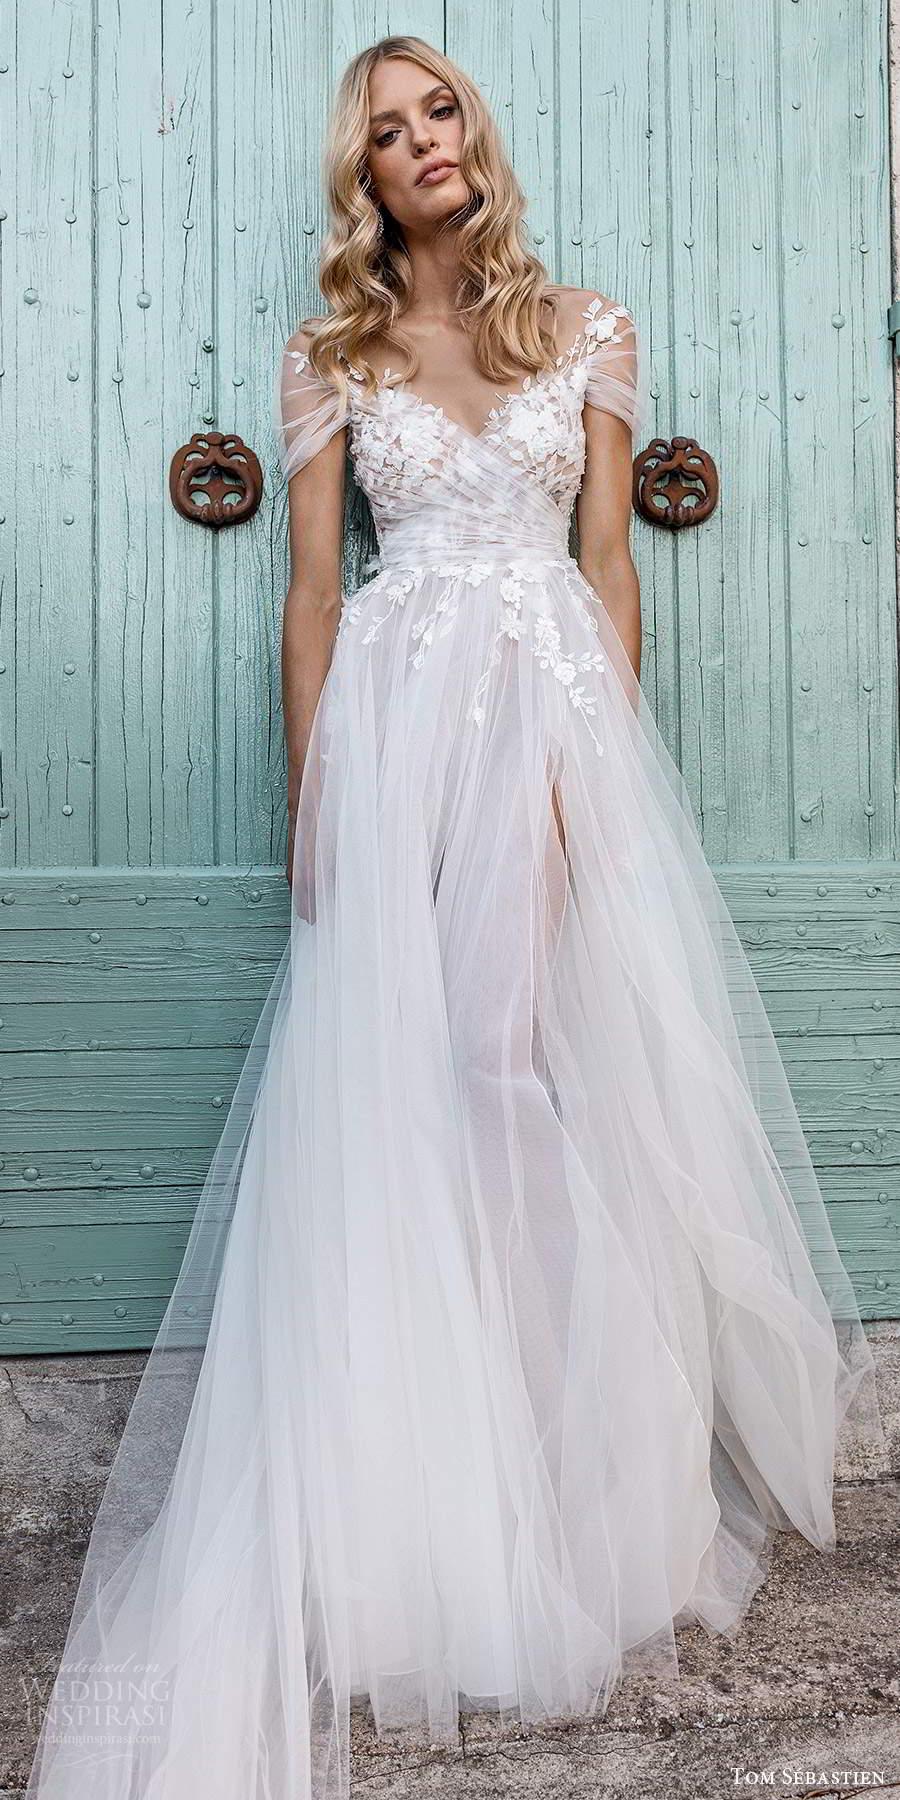 tom sebastien 2021 bridal provence sheer short sleeves surplice v neckline embellished ruched bodice a line ball gown wedding dress chapel train (13) lv